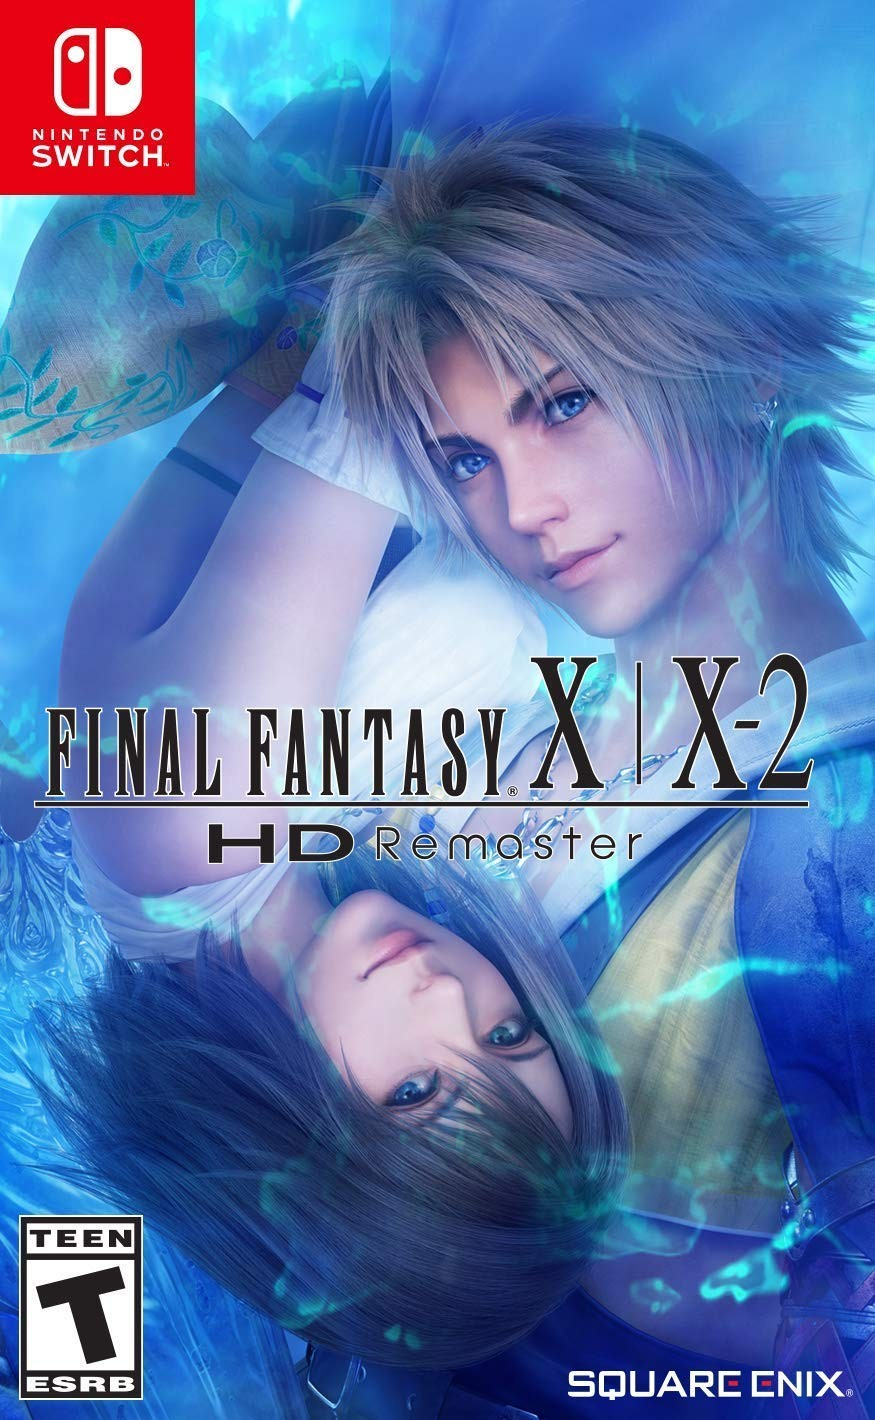 Final Fantasy X и Final Fantasy X-2 HD скоро выйдут на Nintendo Switch и Xbox One - Final Fantasy 10/10-2 HD Remaster